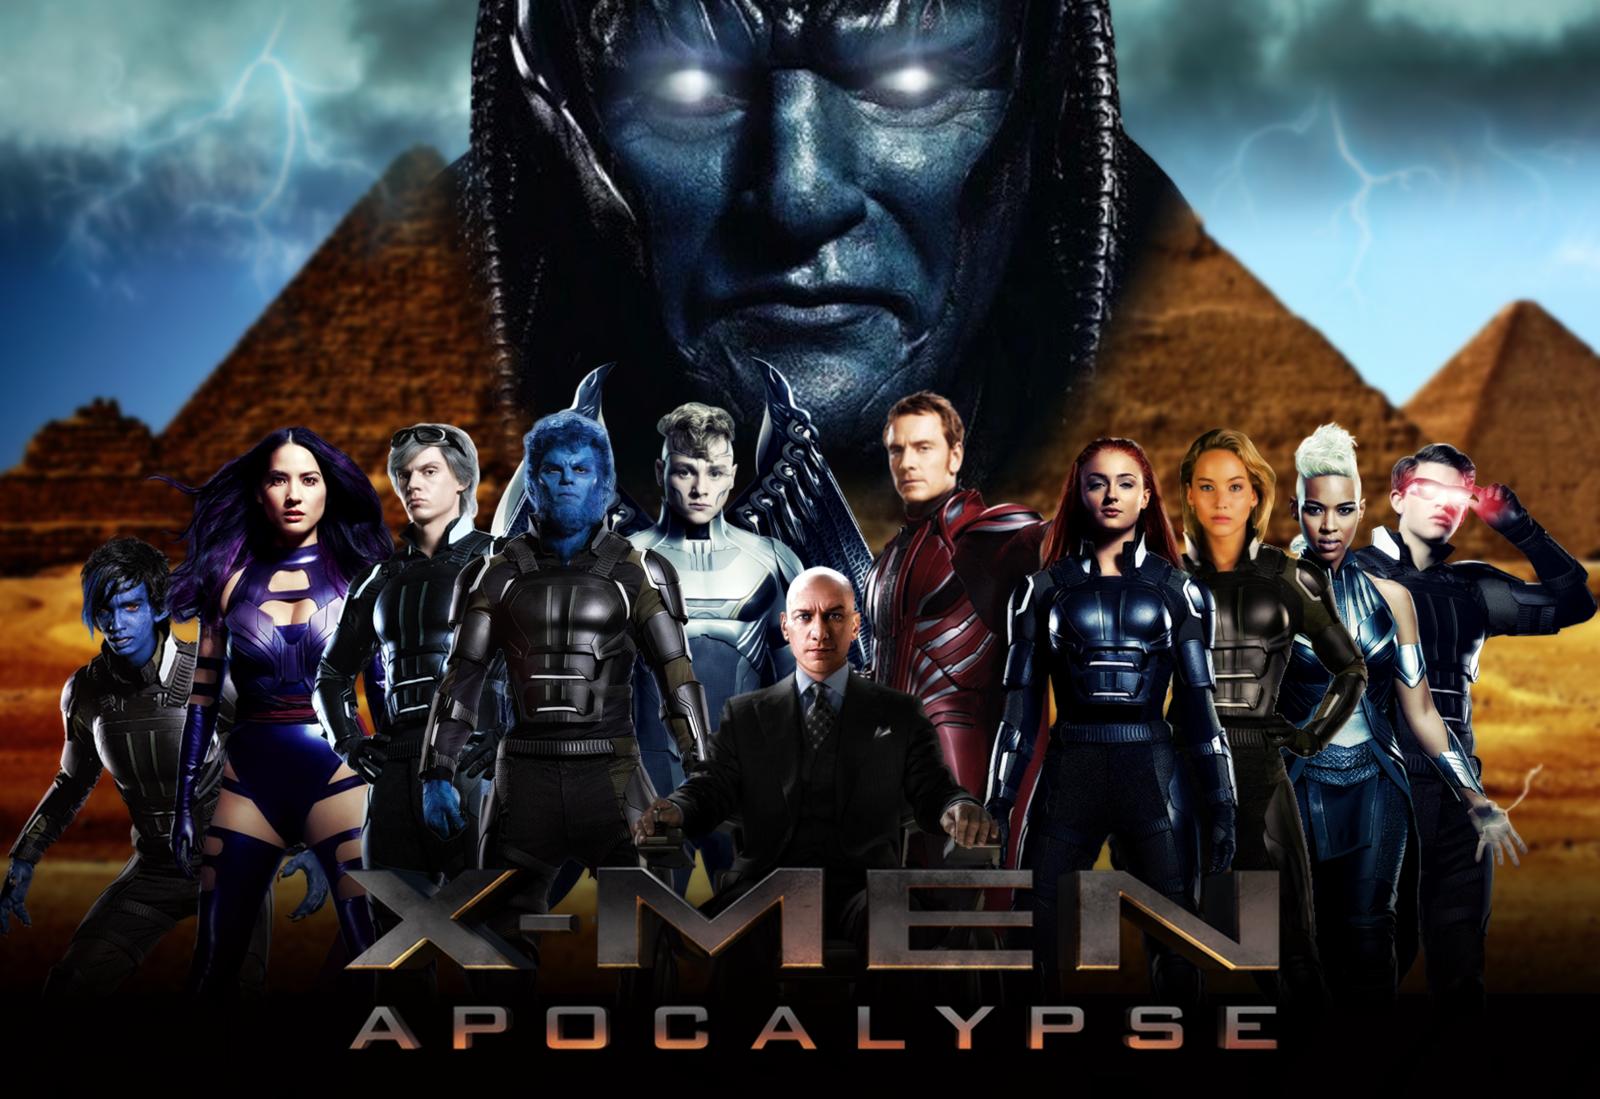 download X men Apocalypse wallpaper by ArkhamNatic [1600x1099 1600x1099